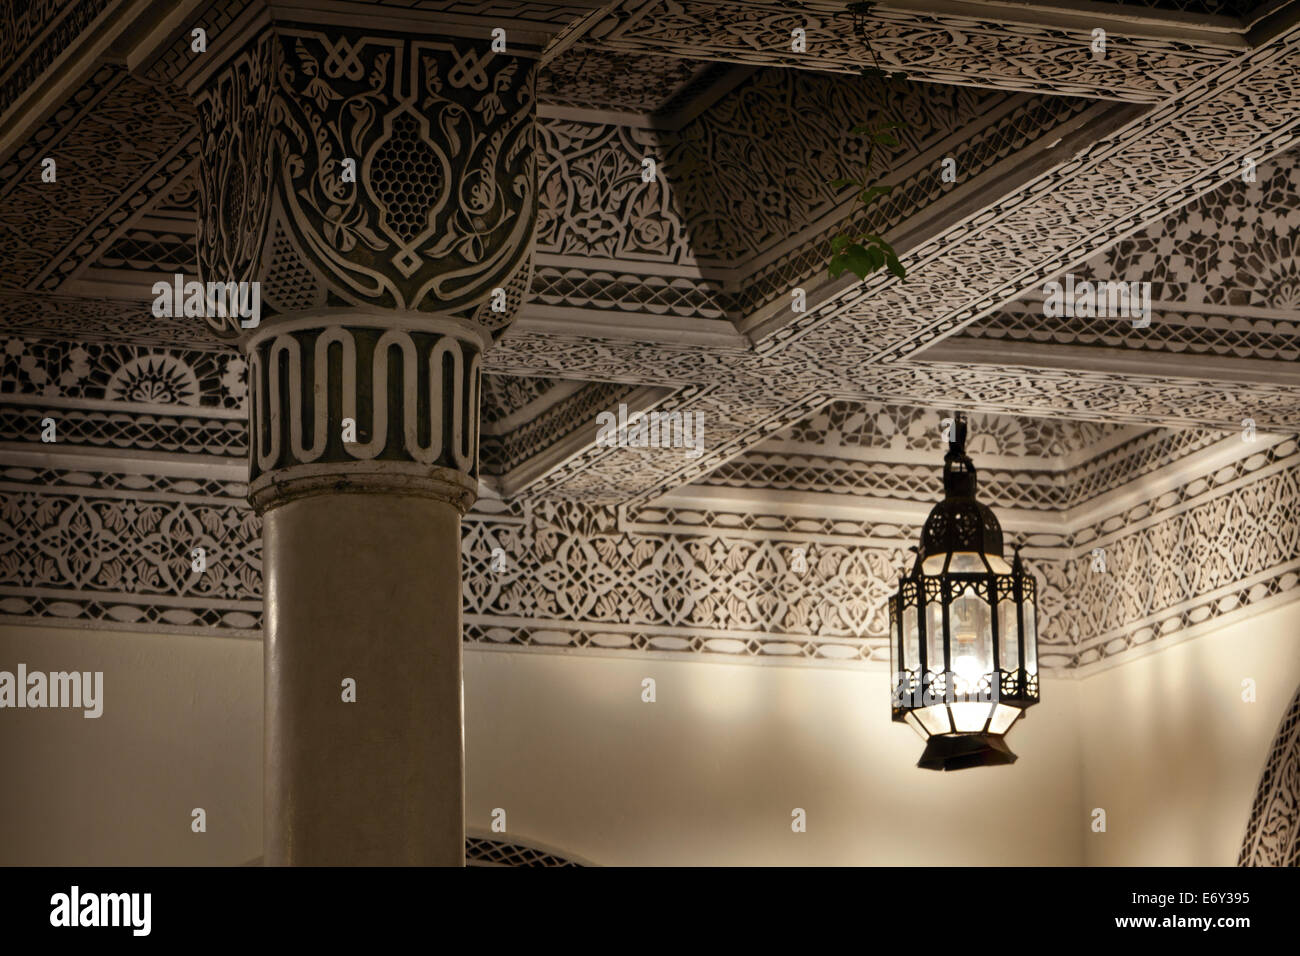 Moroccan Lamp casting light and shadows, Villa des Orangers Stock ...